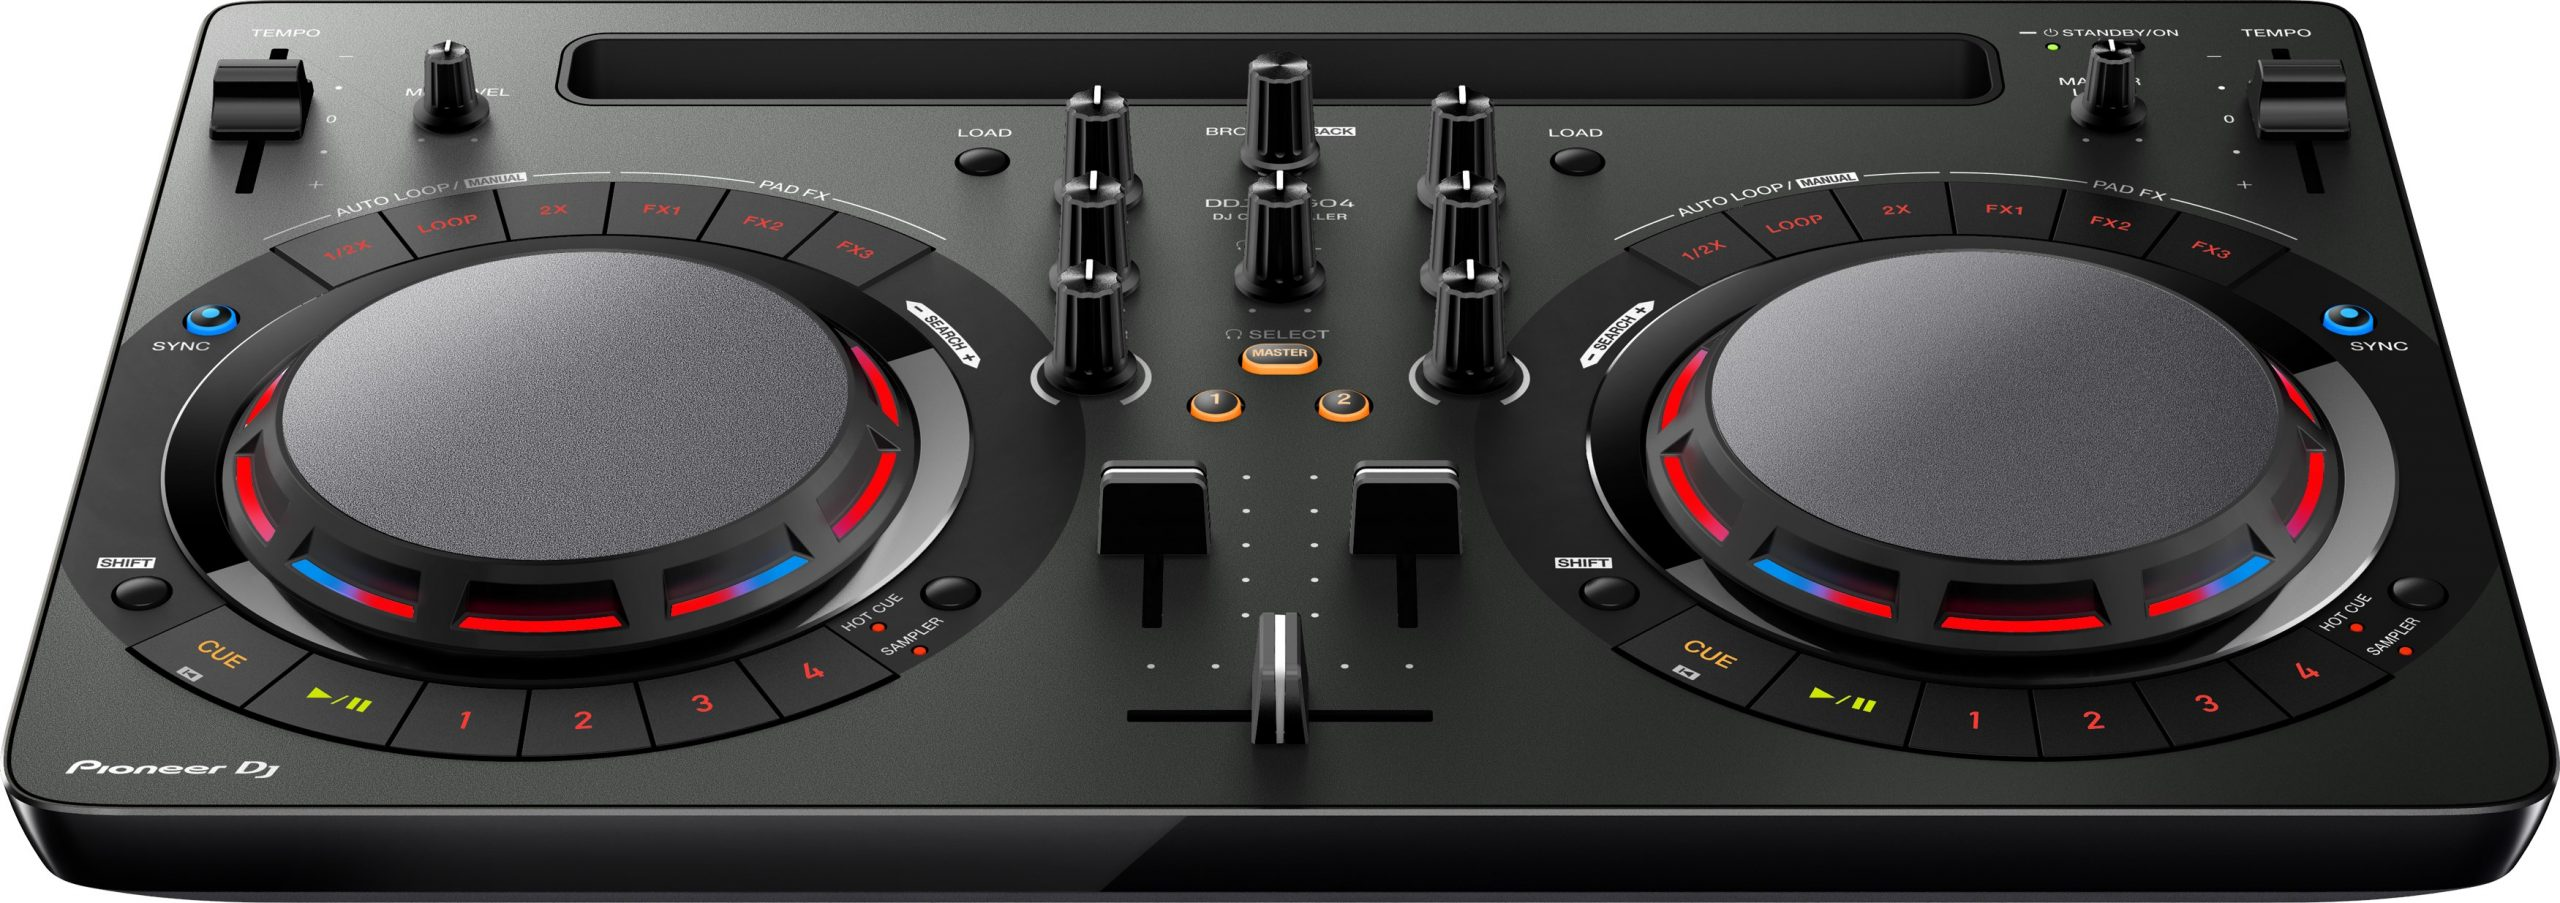 pioneer-ddj-wego4-k-consolle-dj-controller-wego-4-nero-3